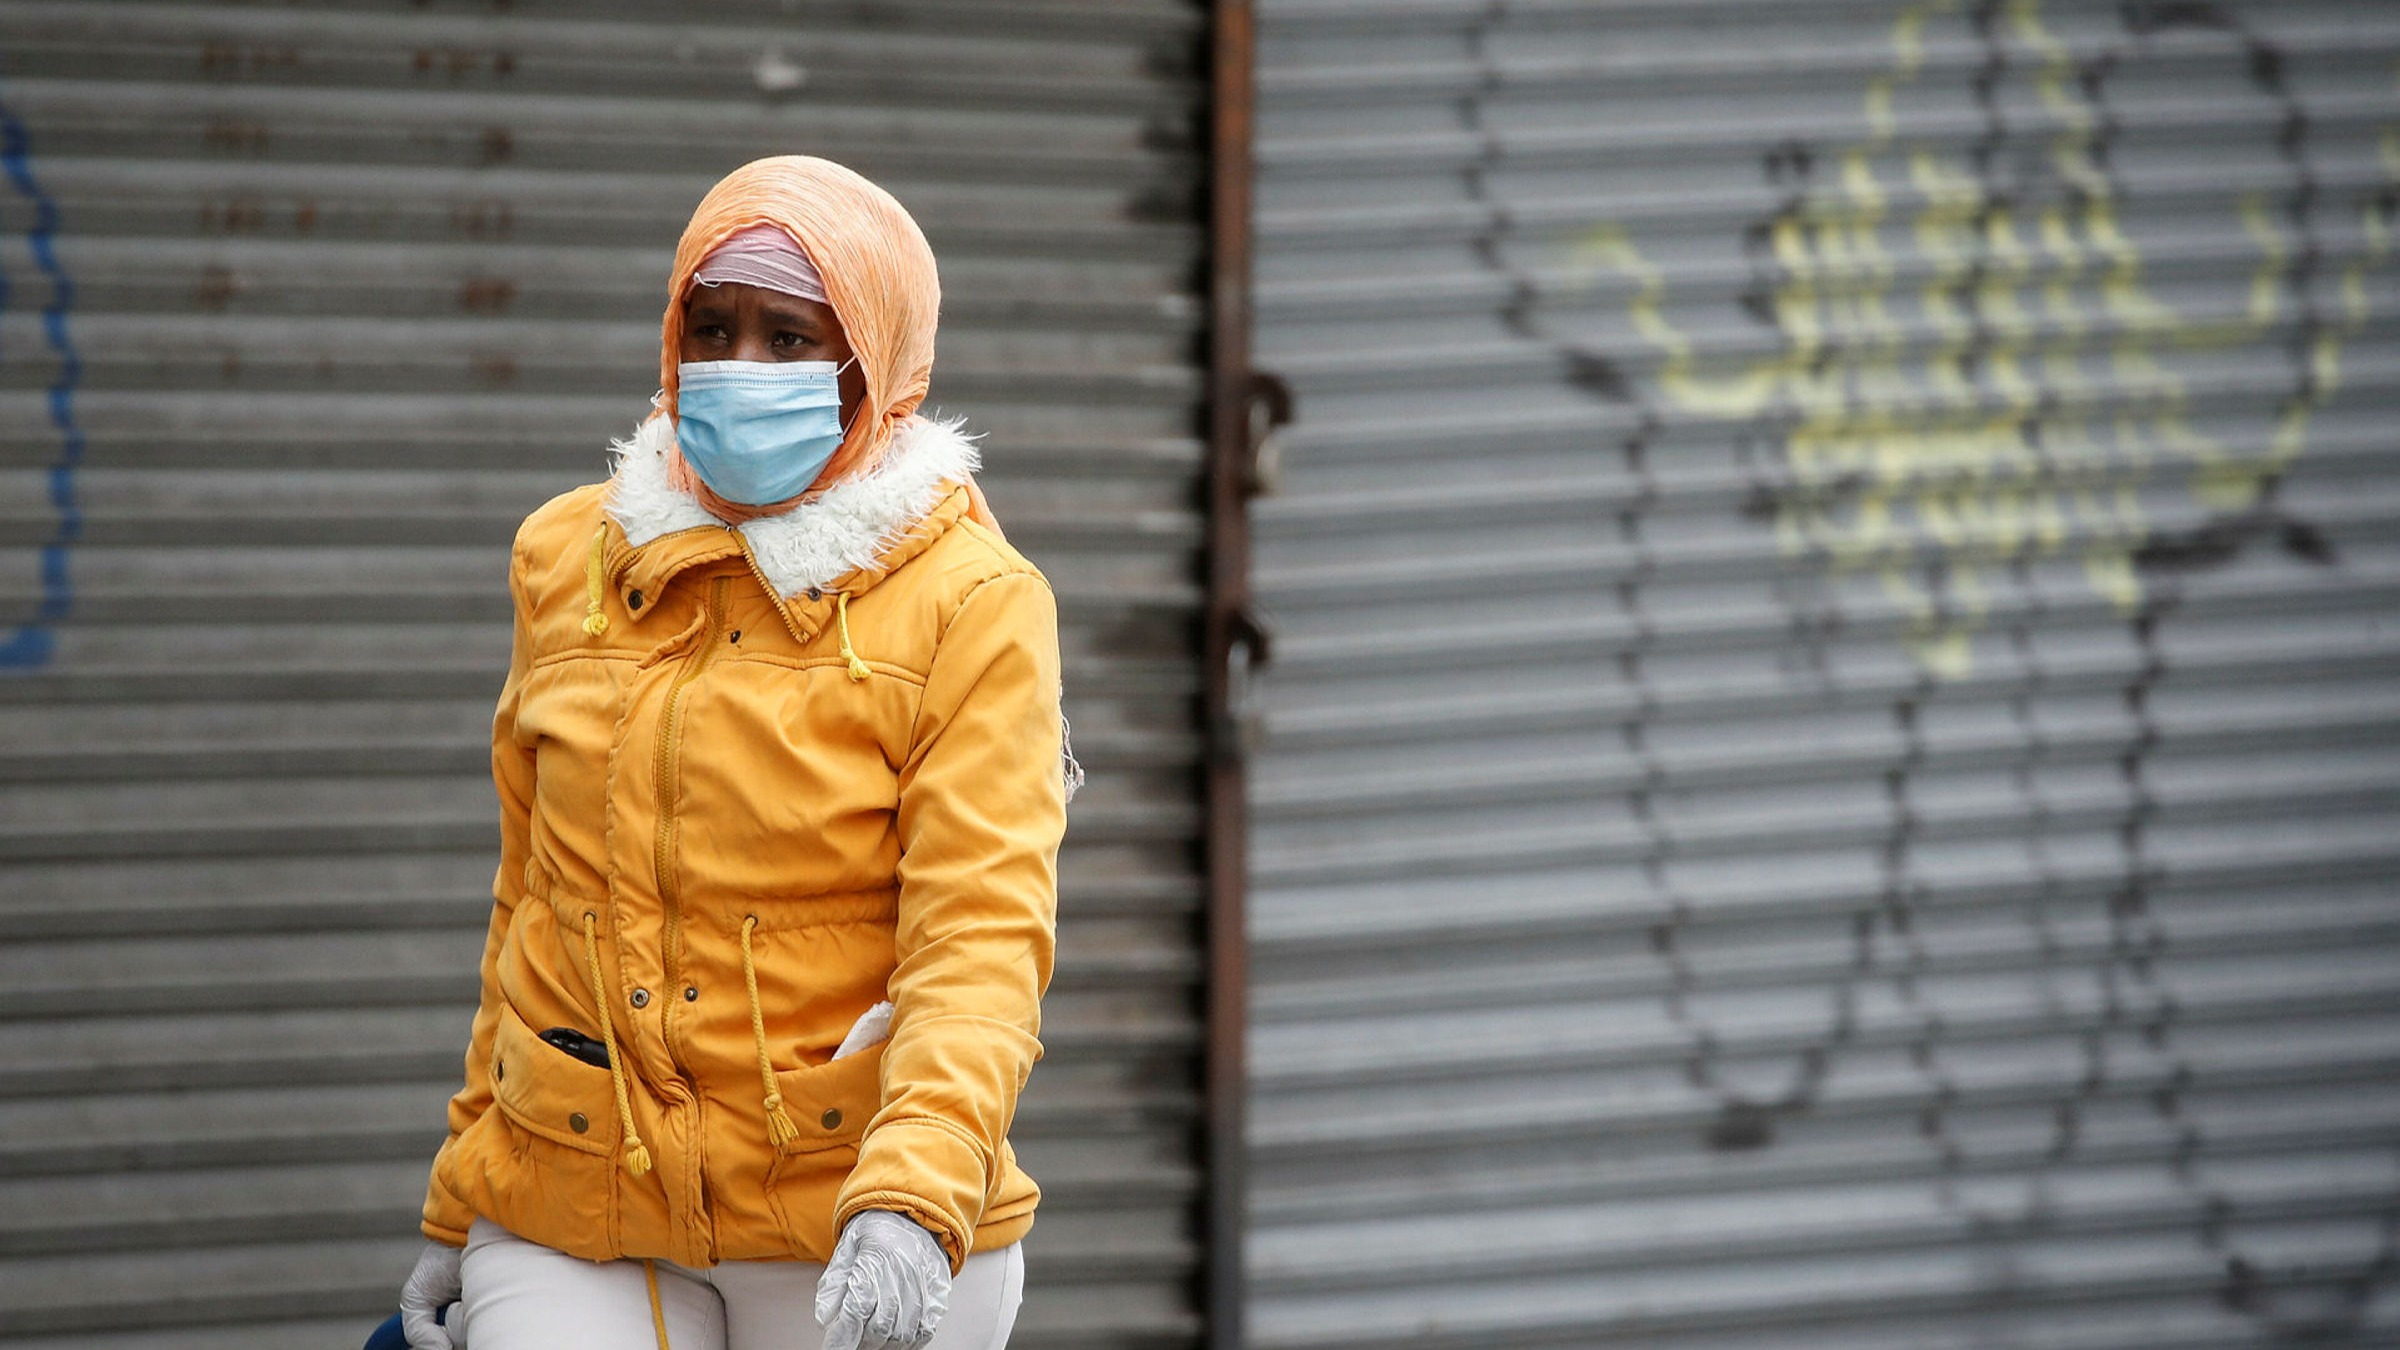 BAEM communities hardest hit by virus